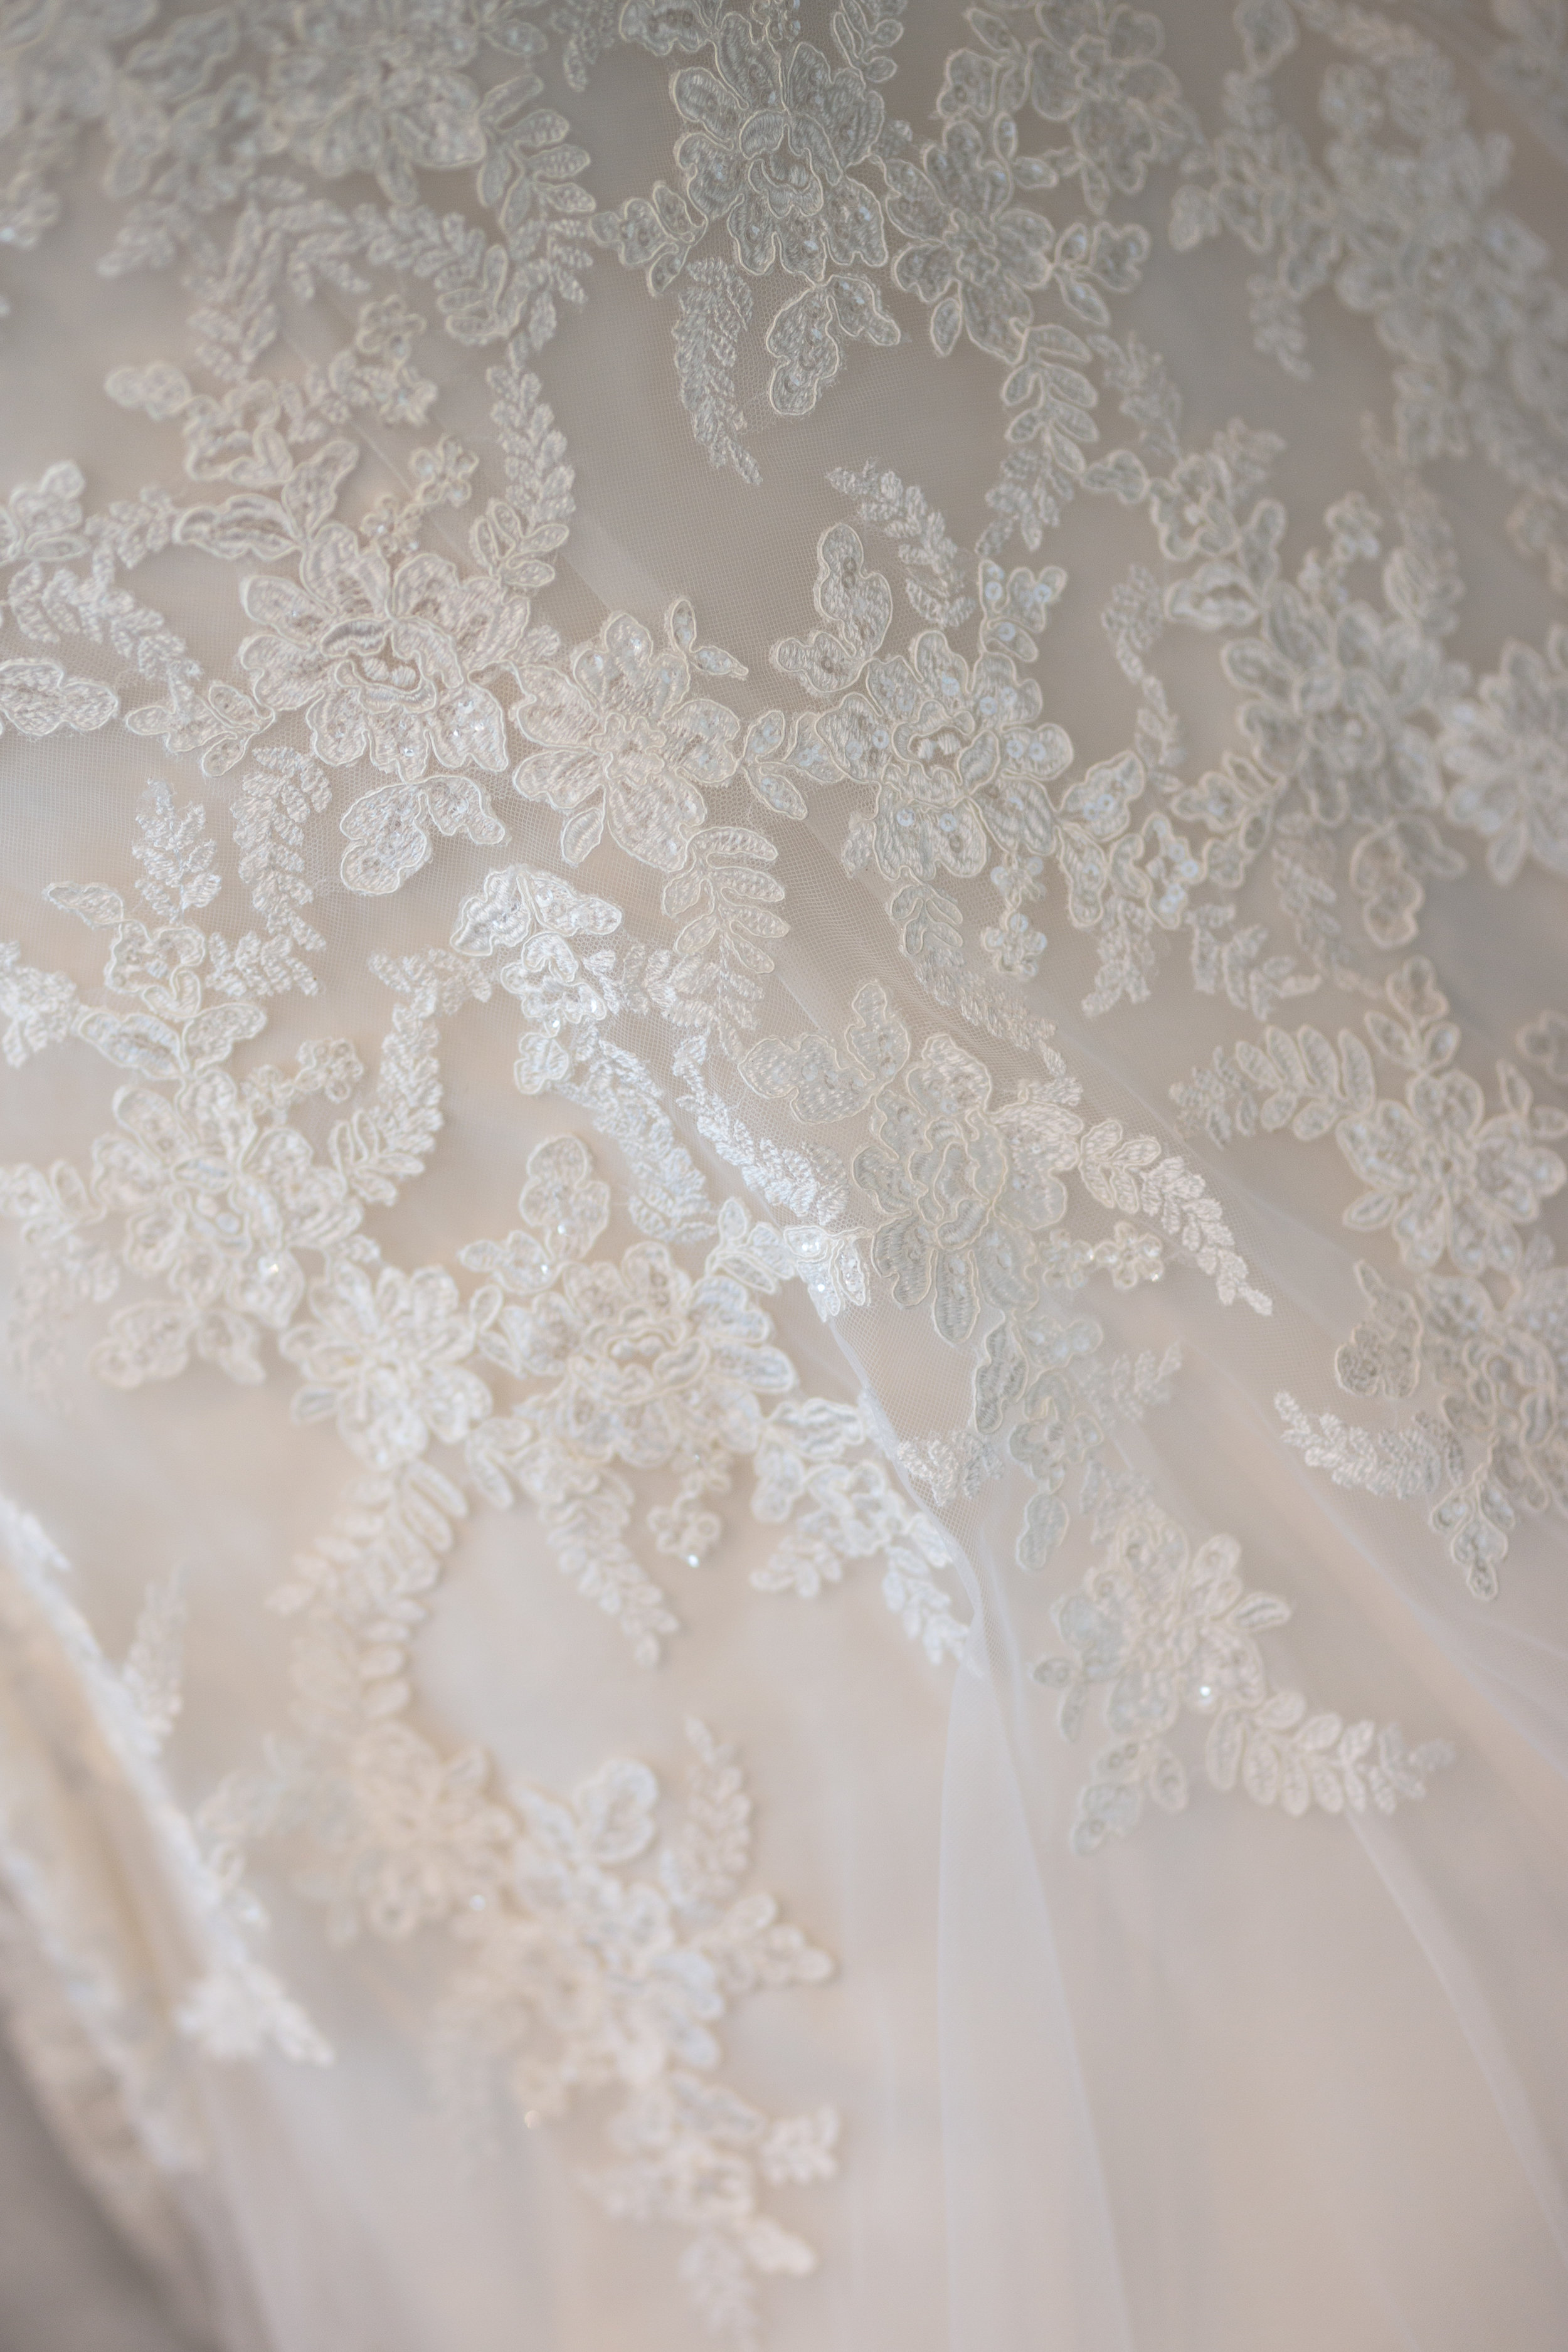 Antoinette & Stephen - Bridal Preparations | Brian McEwan Photography | Wedding Photographer Northern Ireland 150.jpg